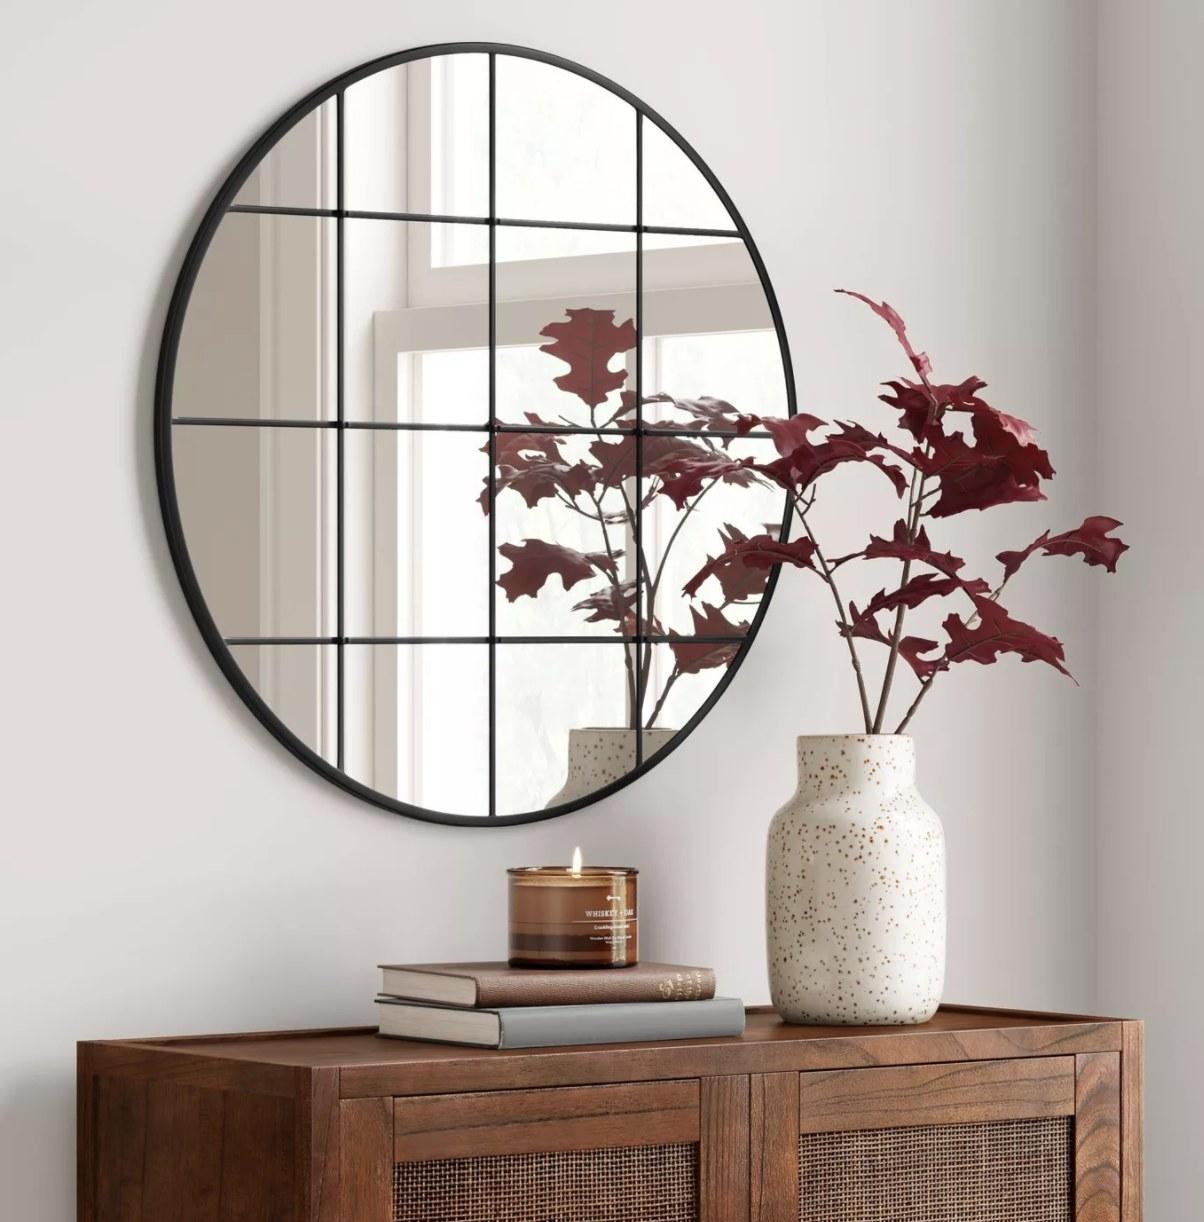 The window-pane mirror